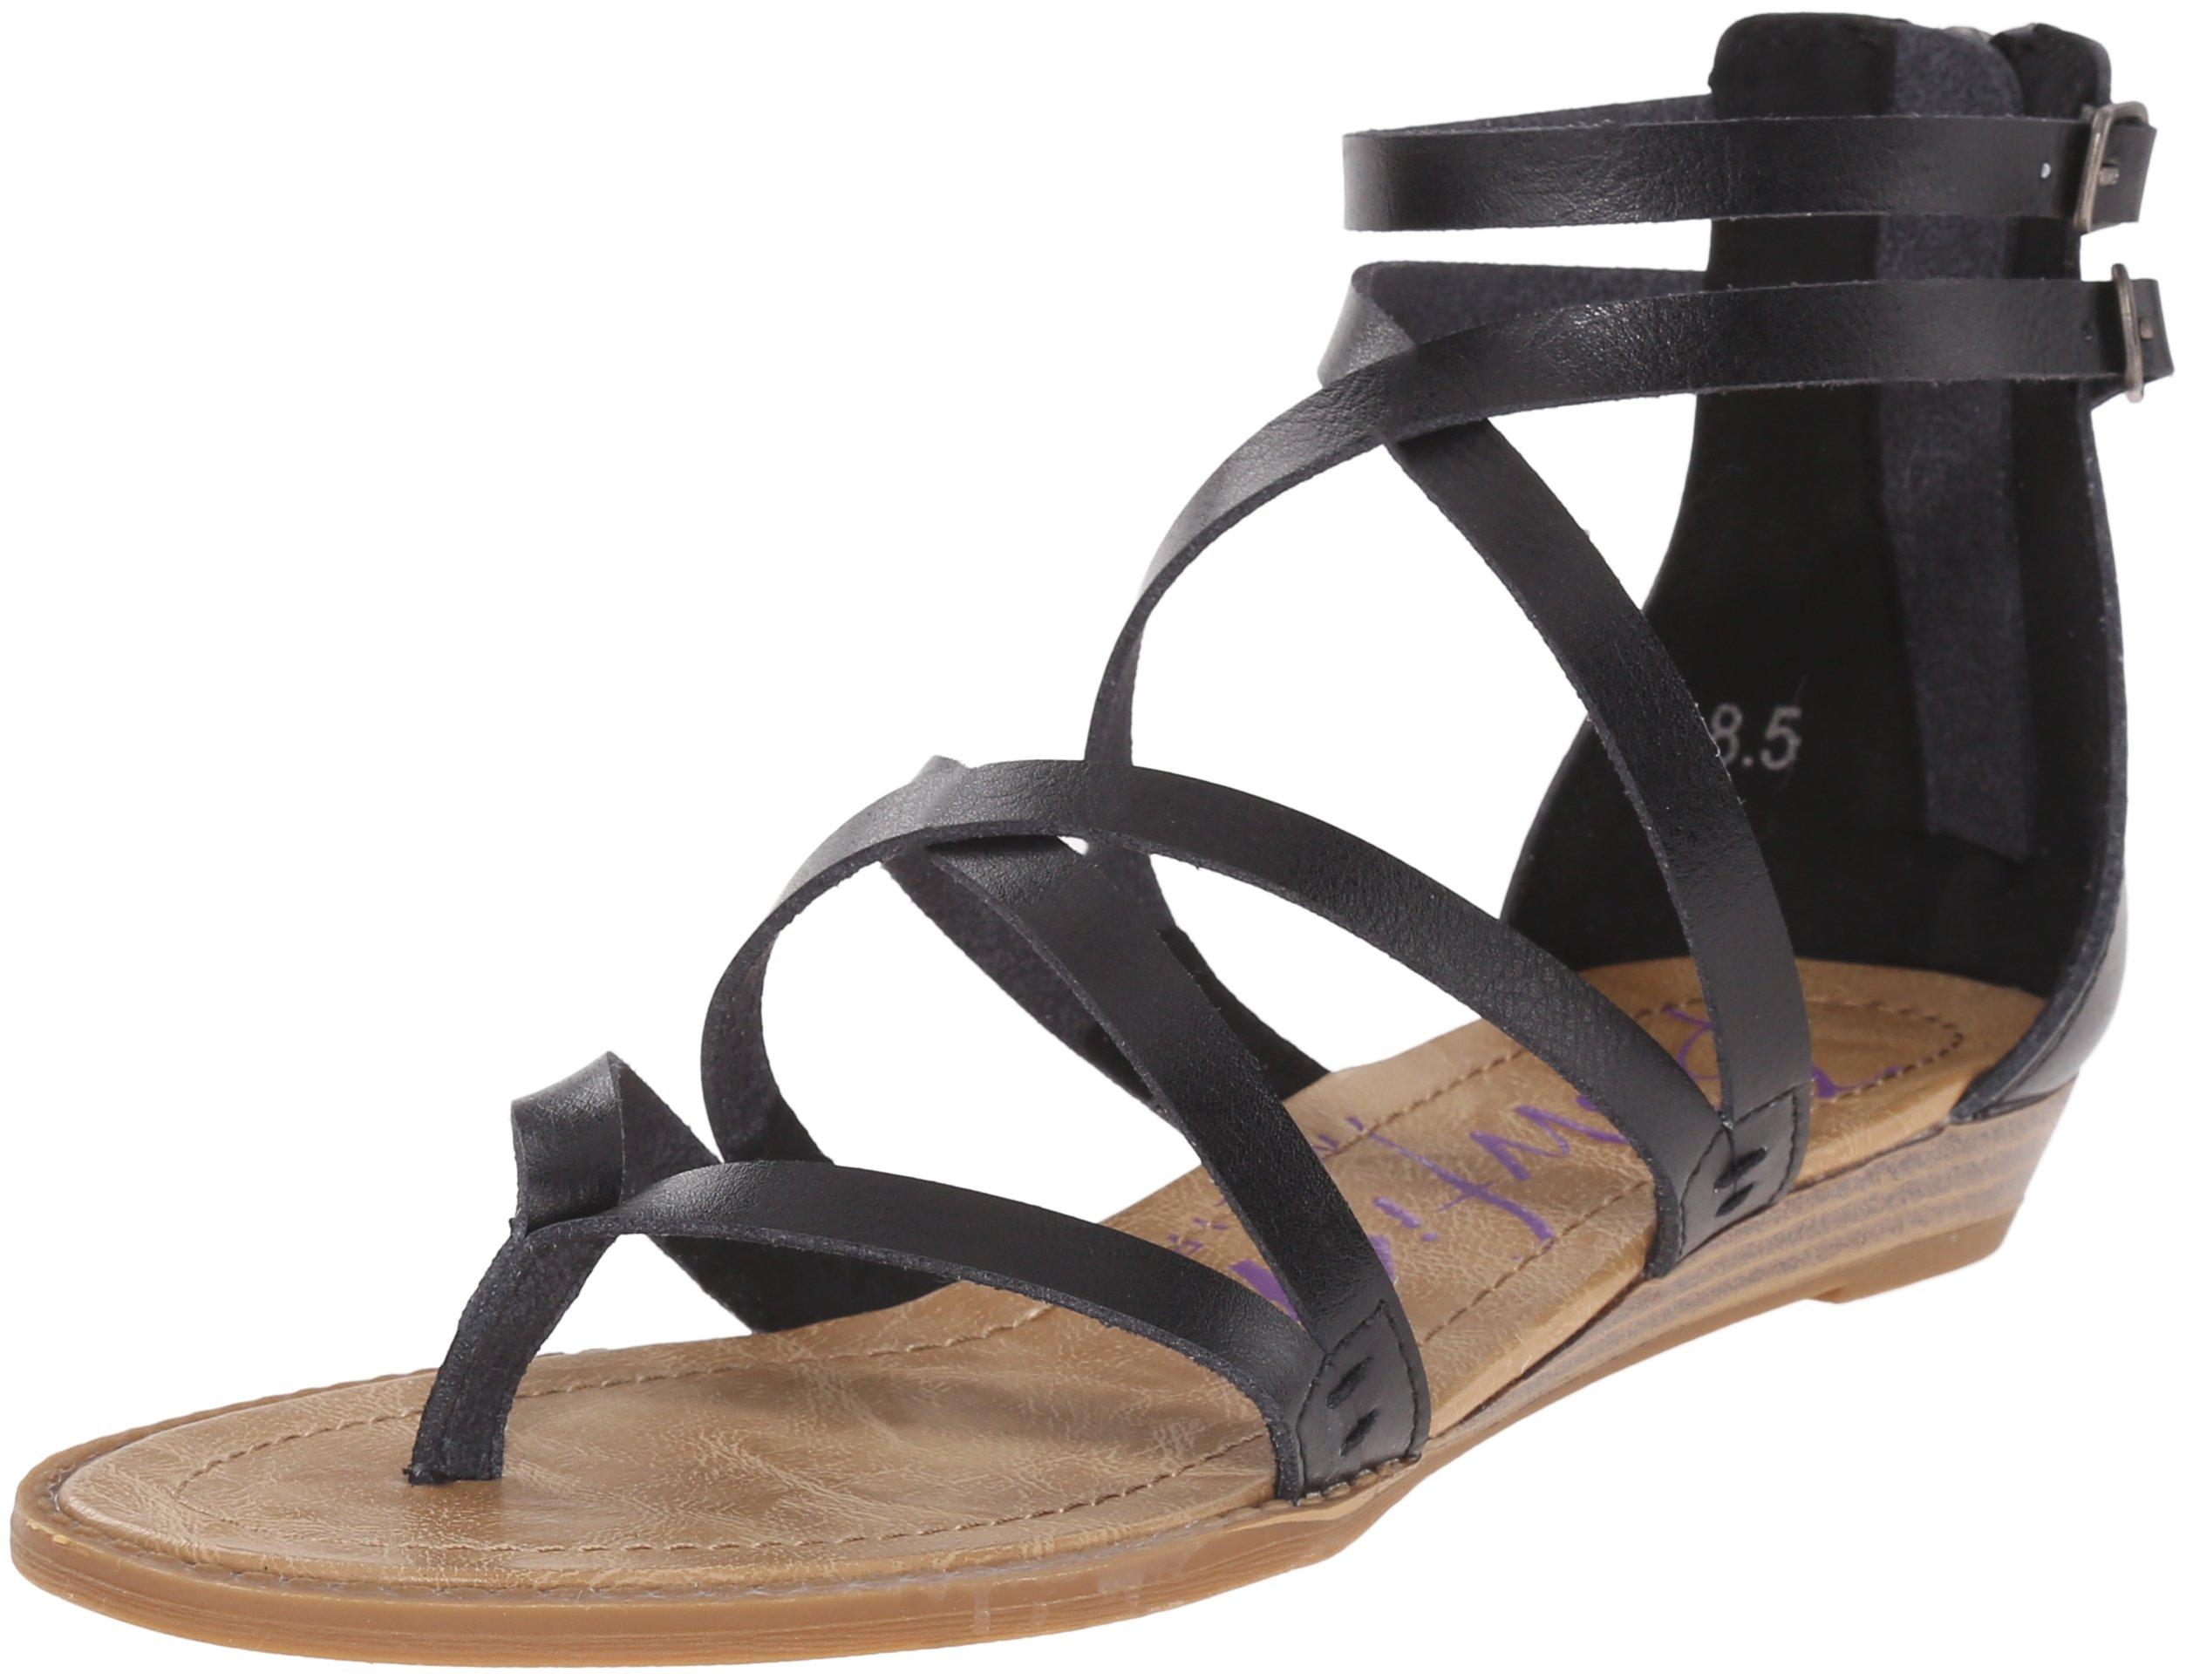 Blowfish Women's Bungalow Sandal, Black, 6.5 M US